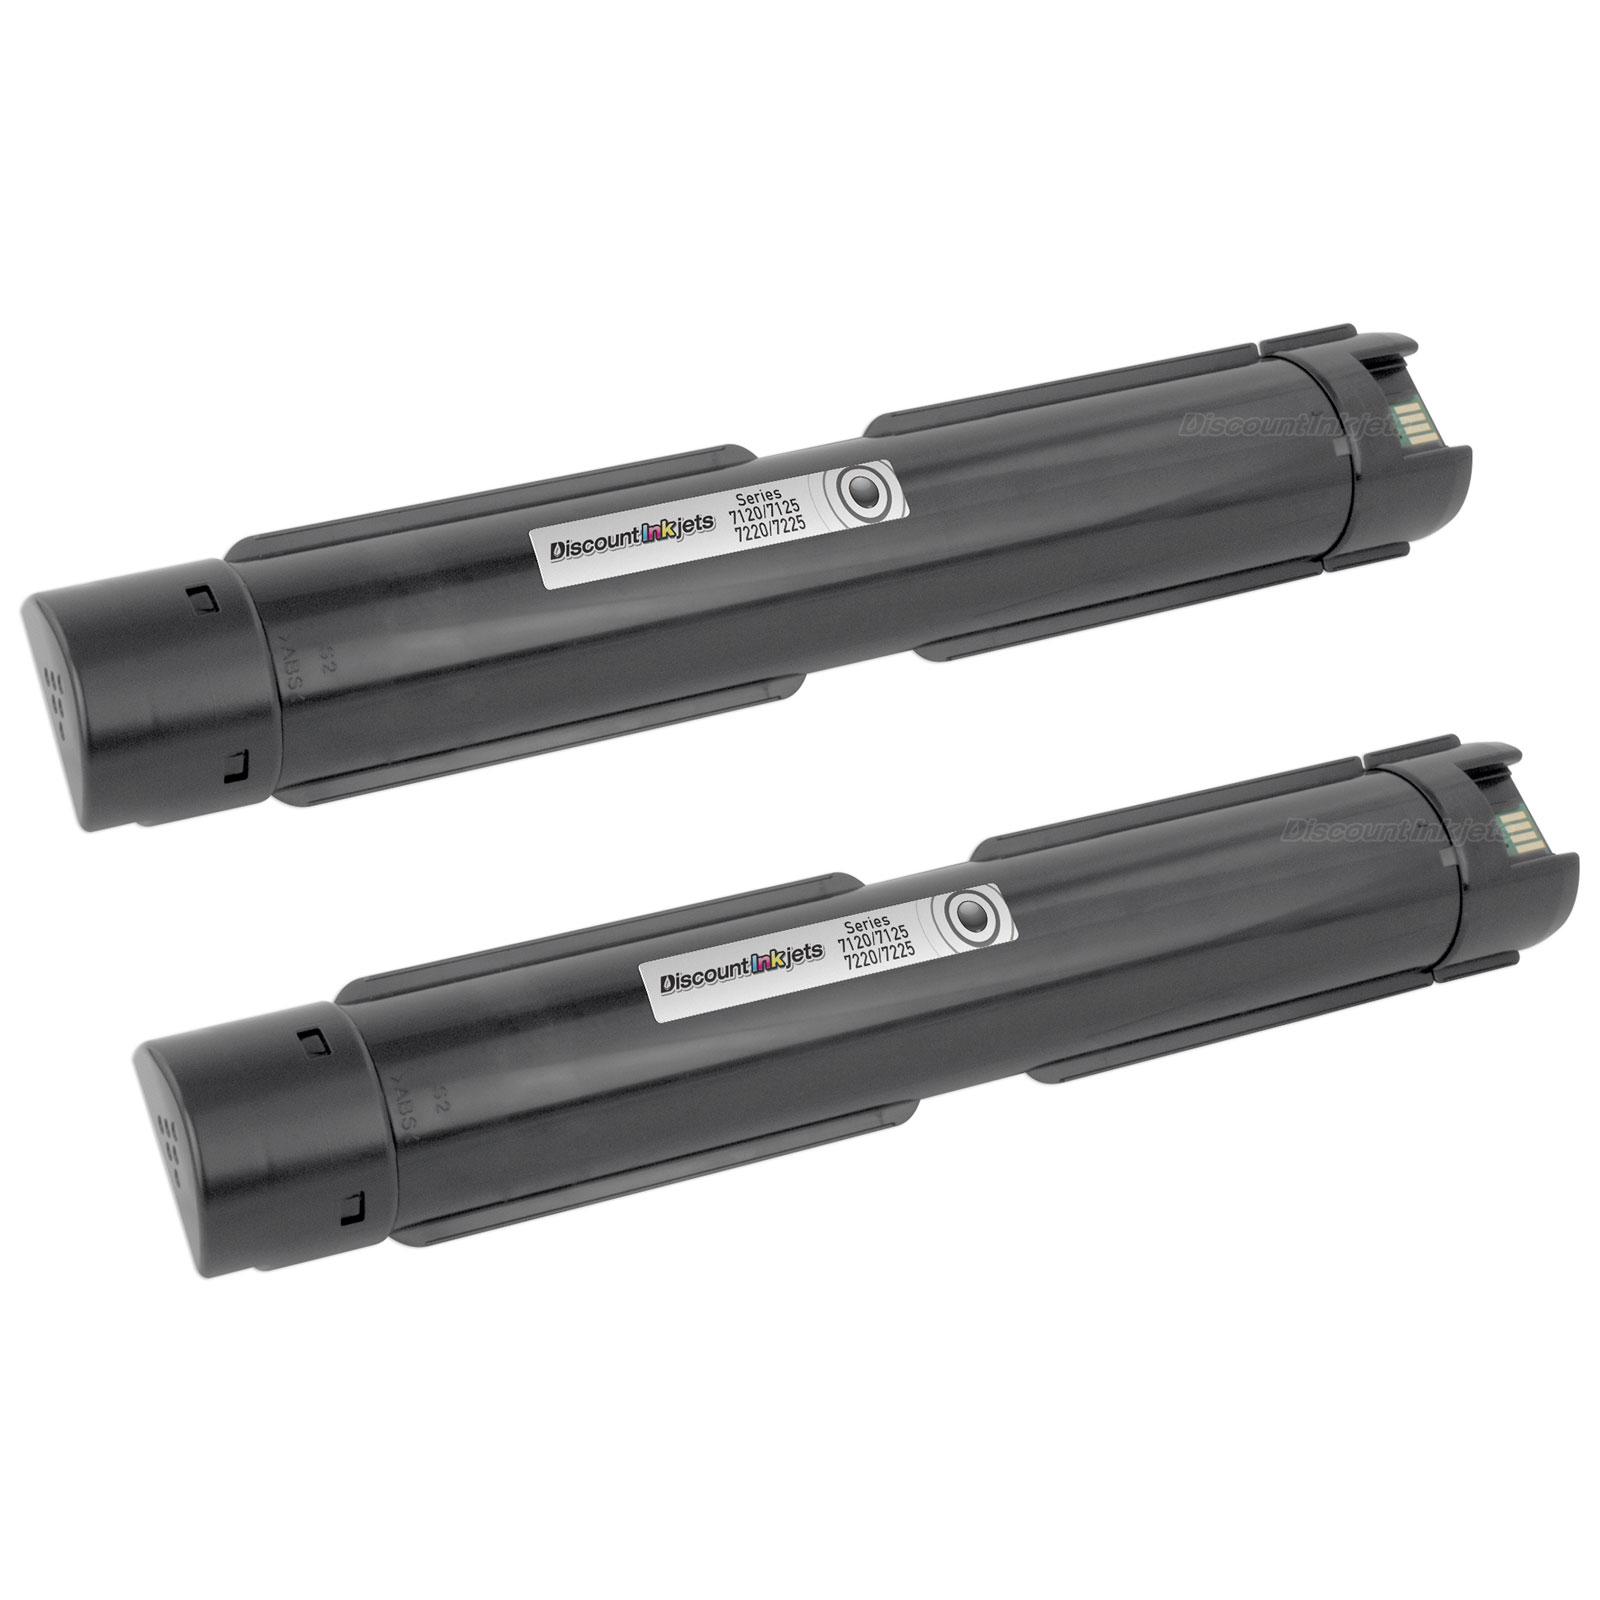 6R1457 BLACK Toner for XEROX 006R01457 WorkCentre 7120 //7125 //7220 //7225